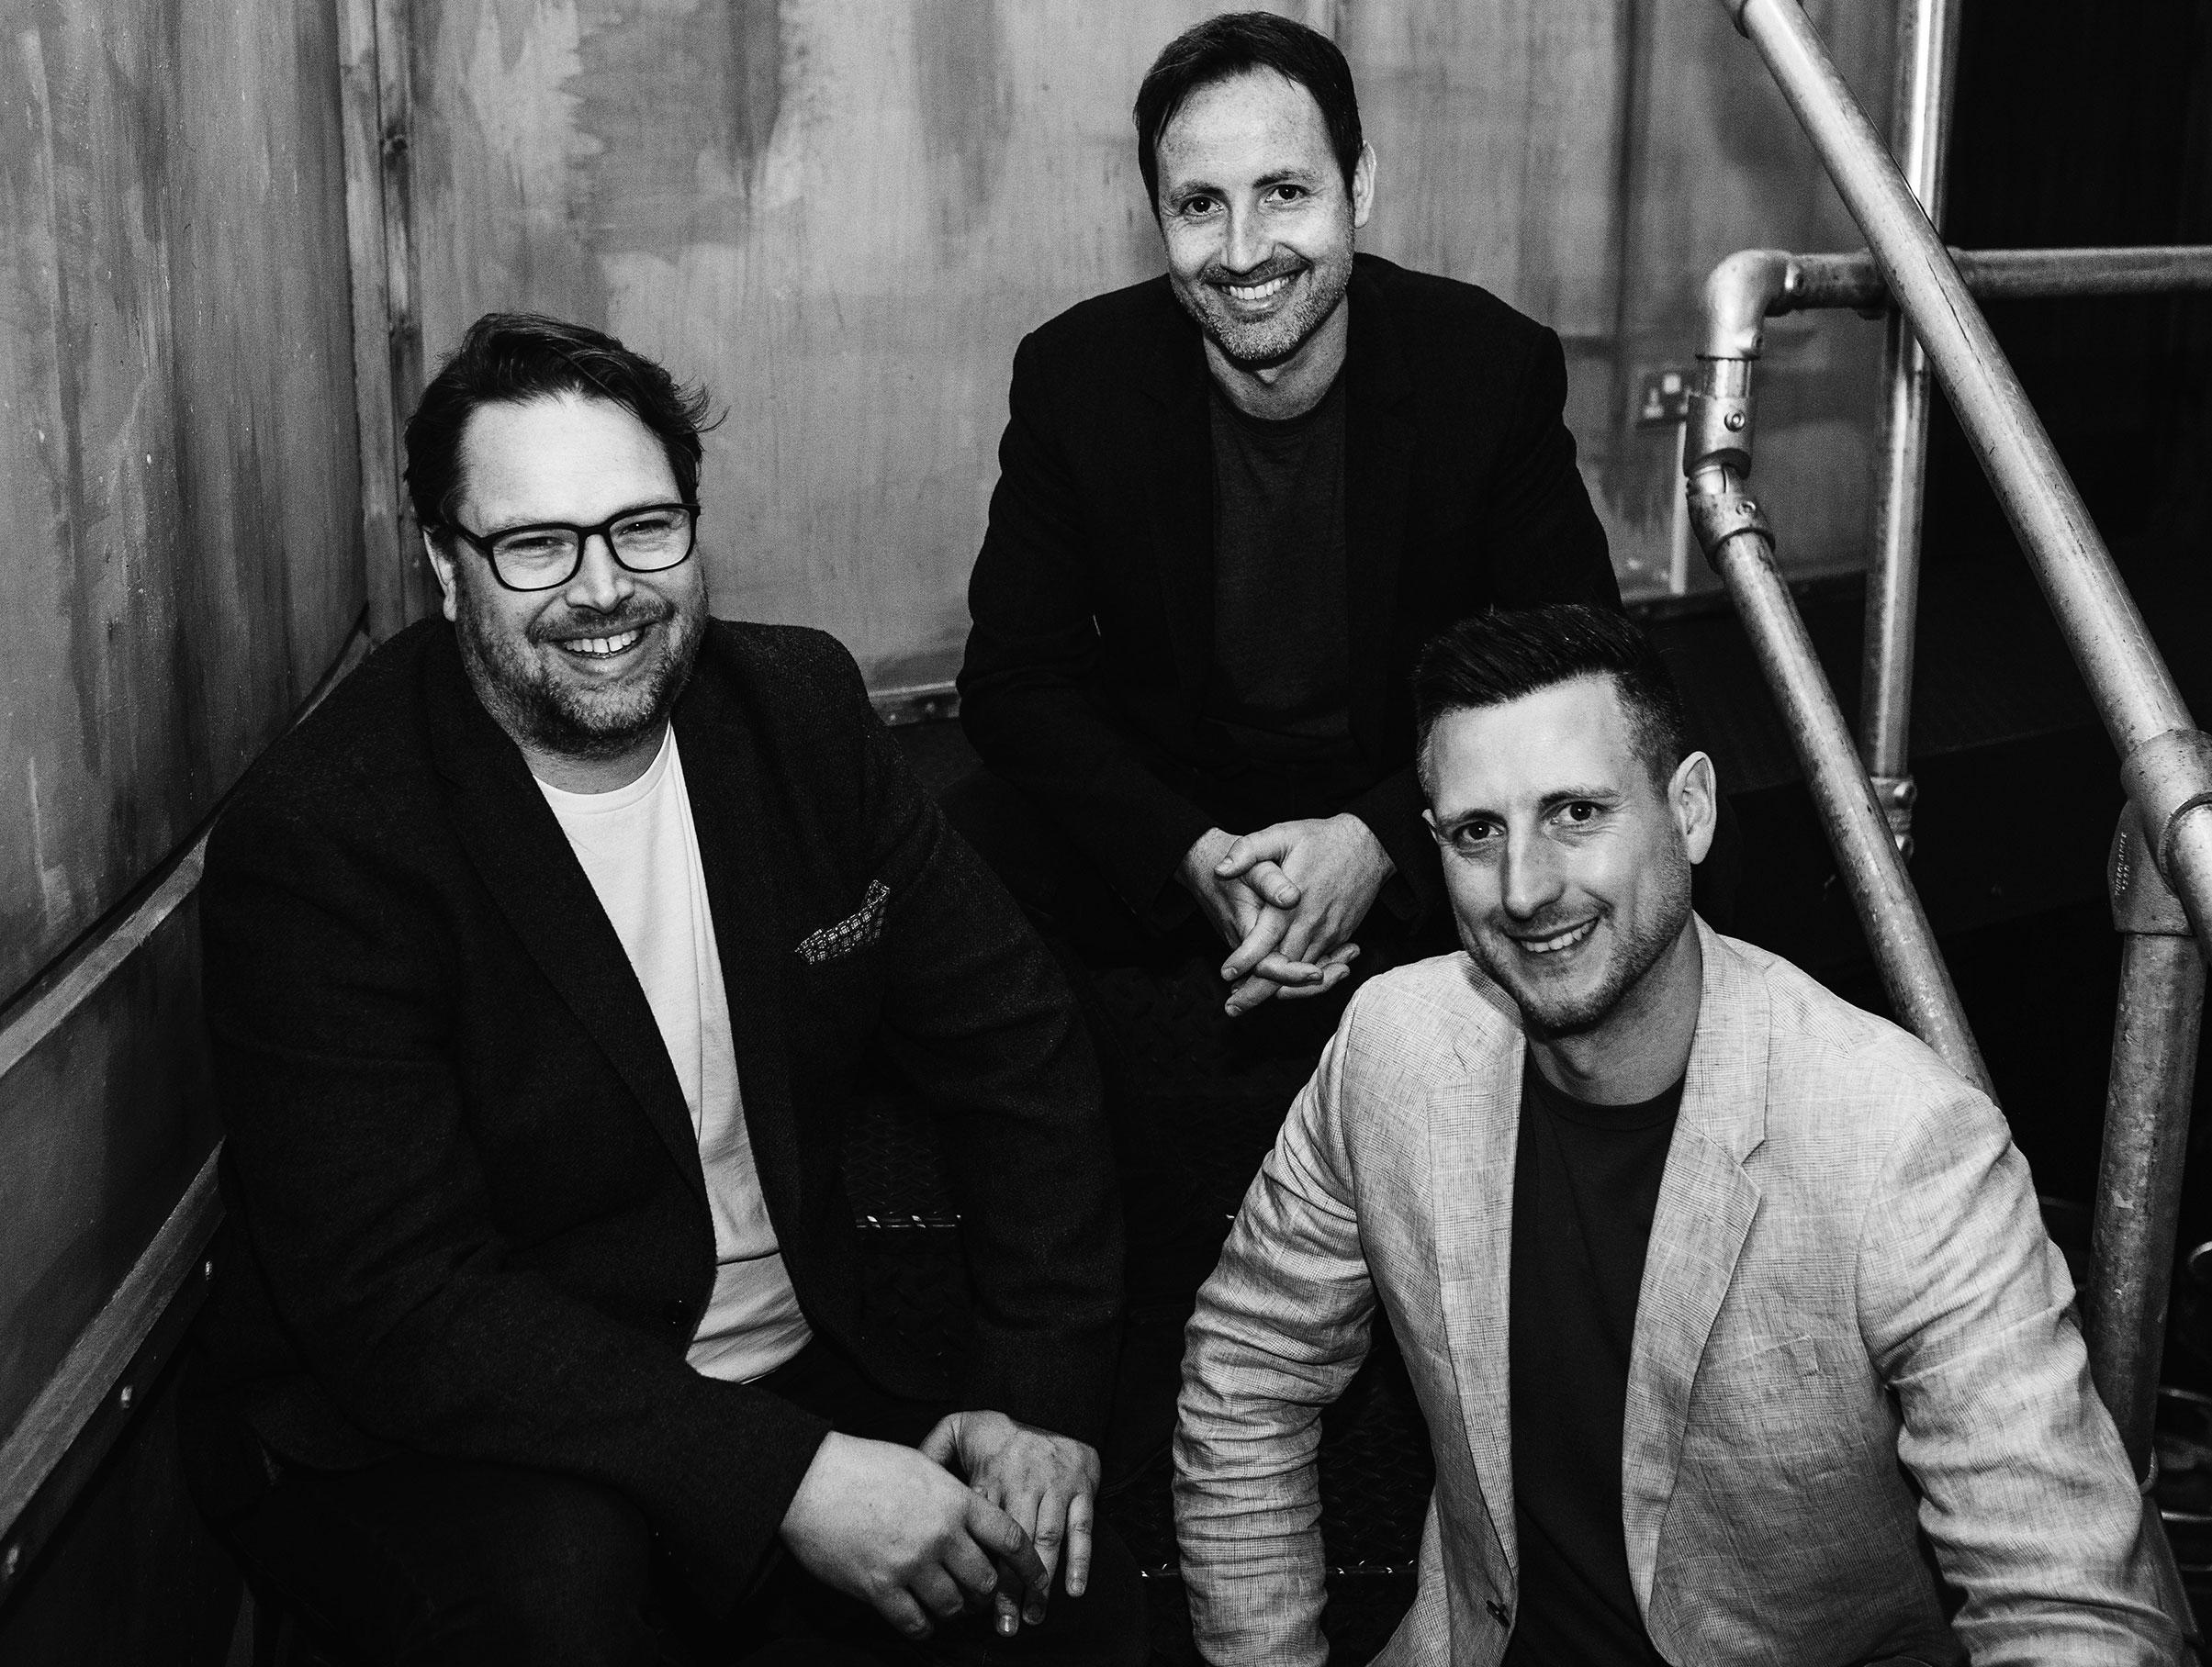 Dan, Stu and Steve - Zool Directors